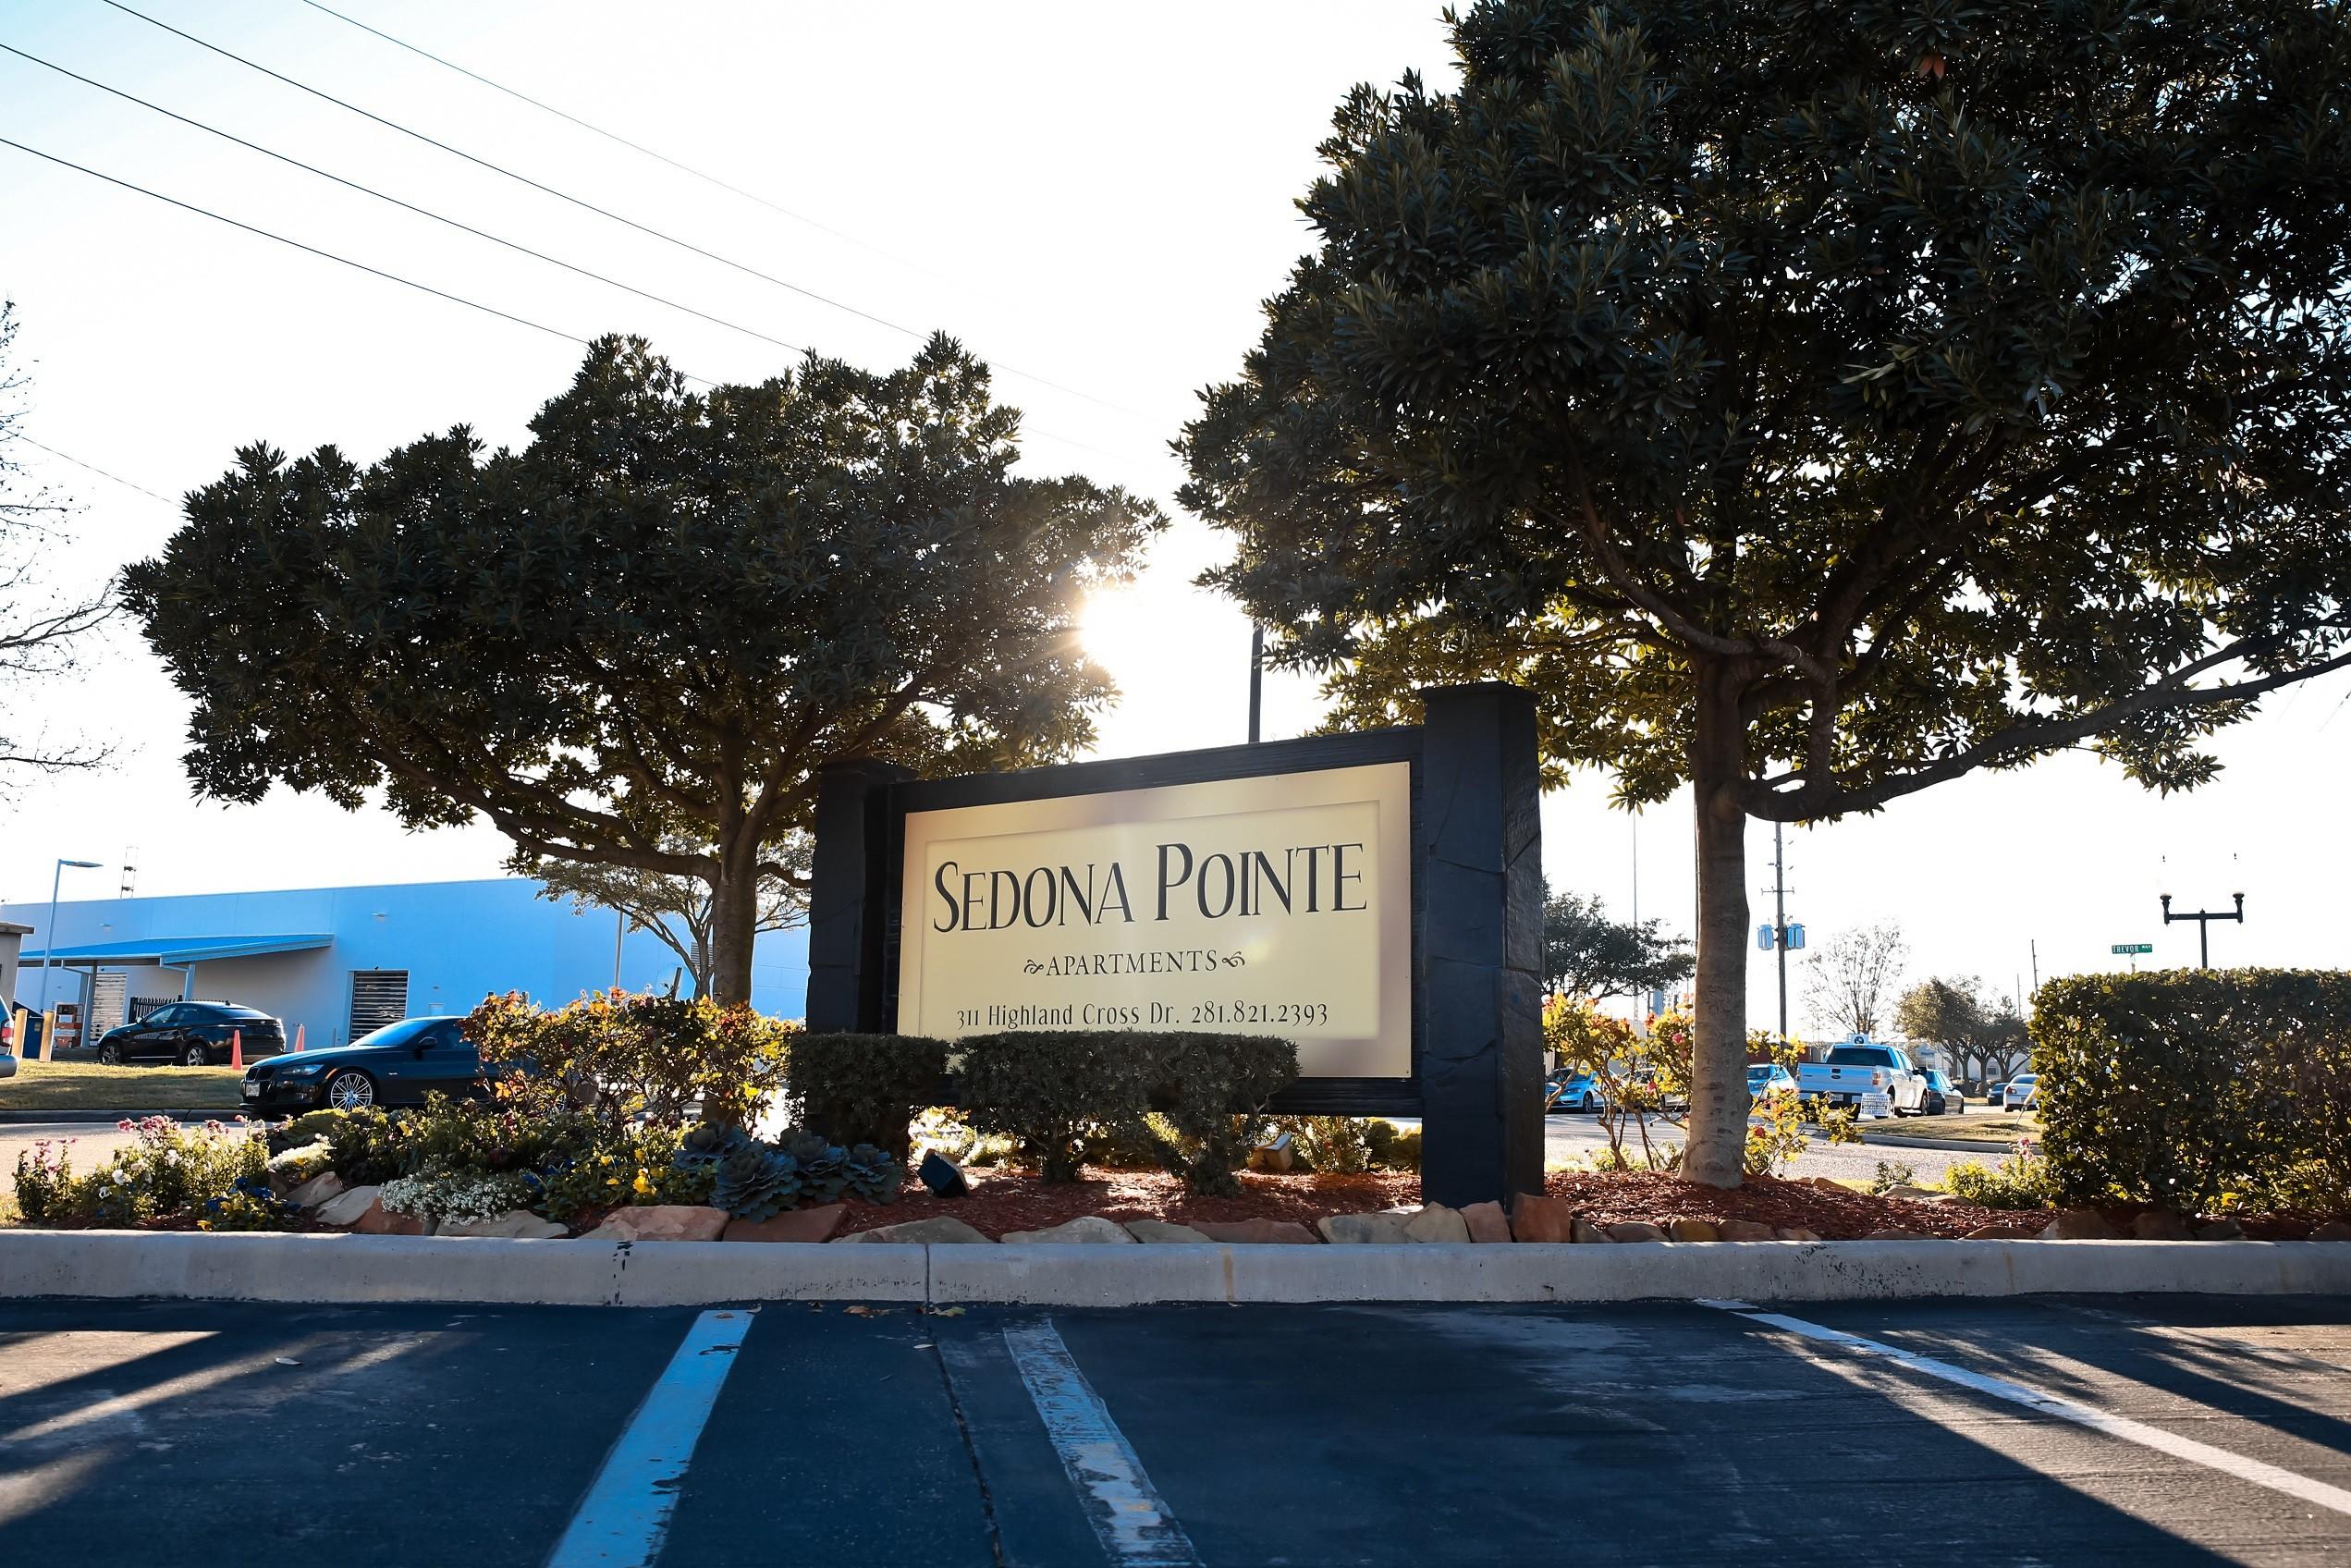 Sedona Pointe for rent